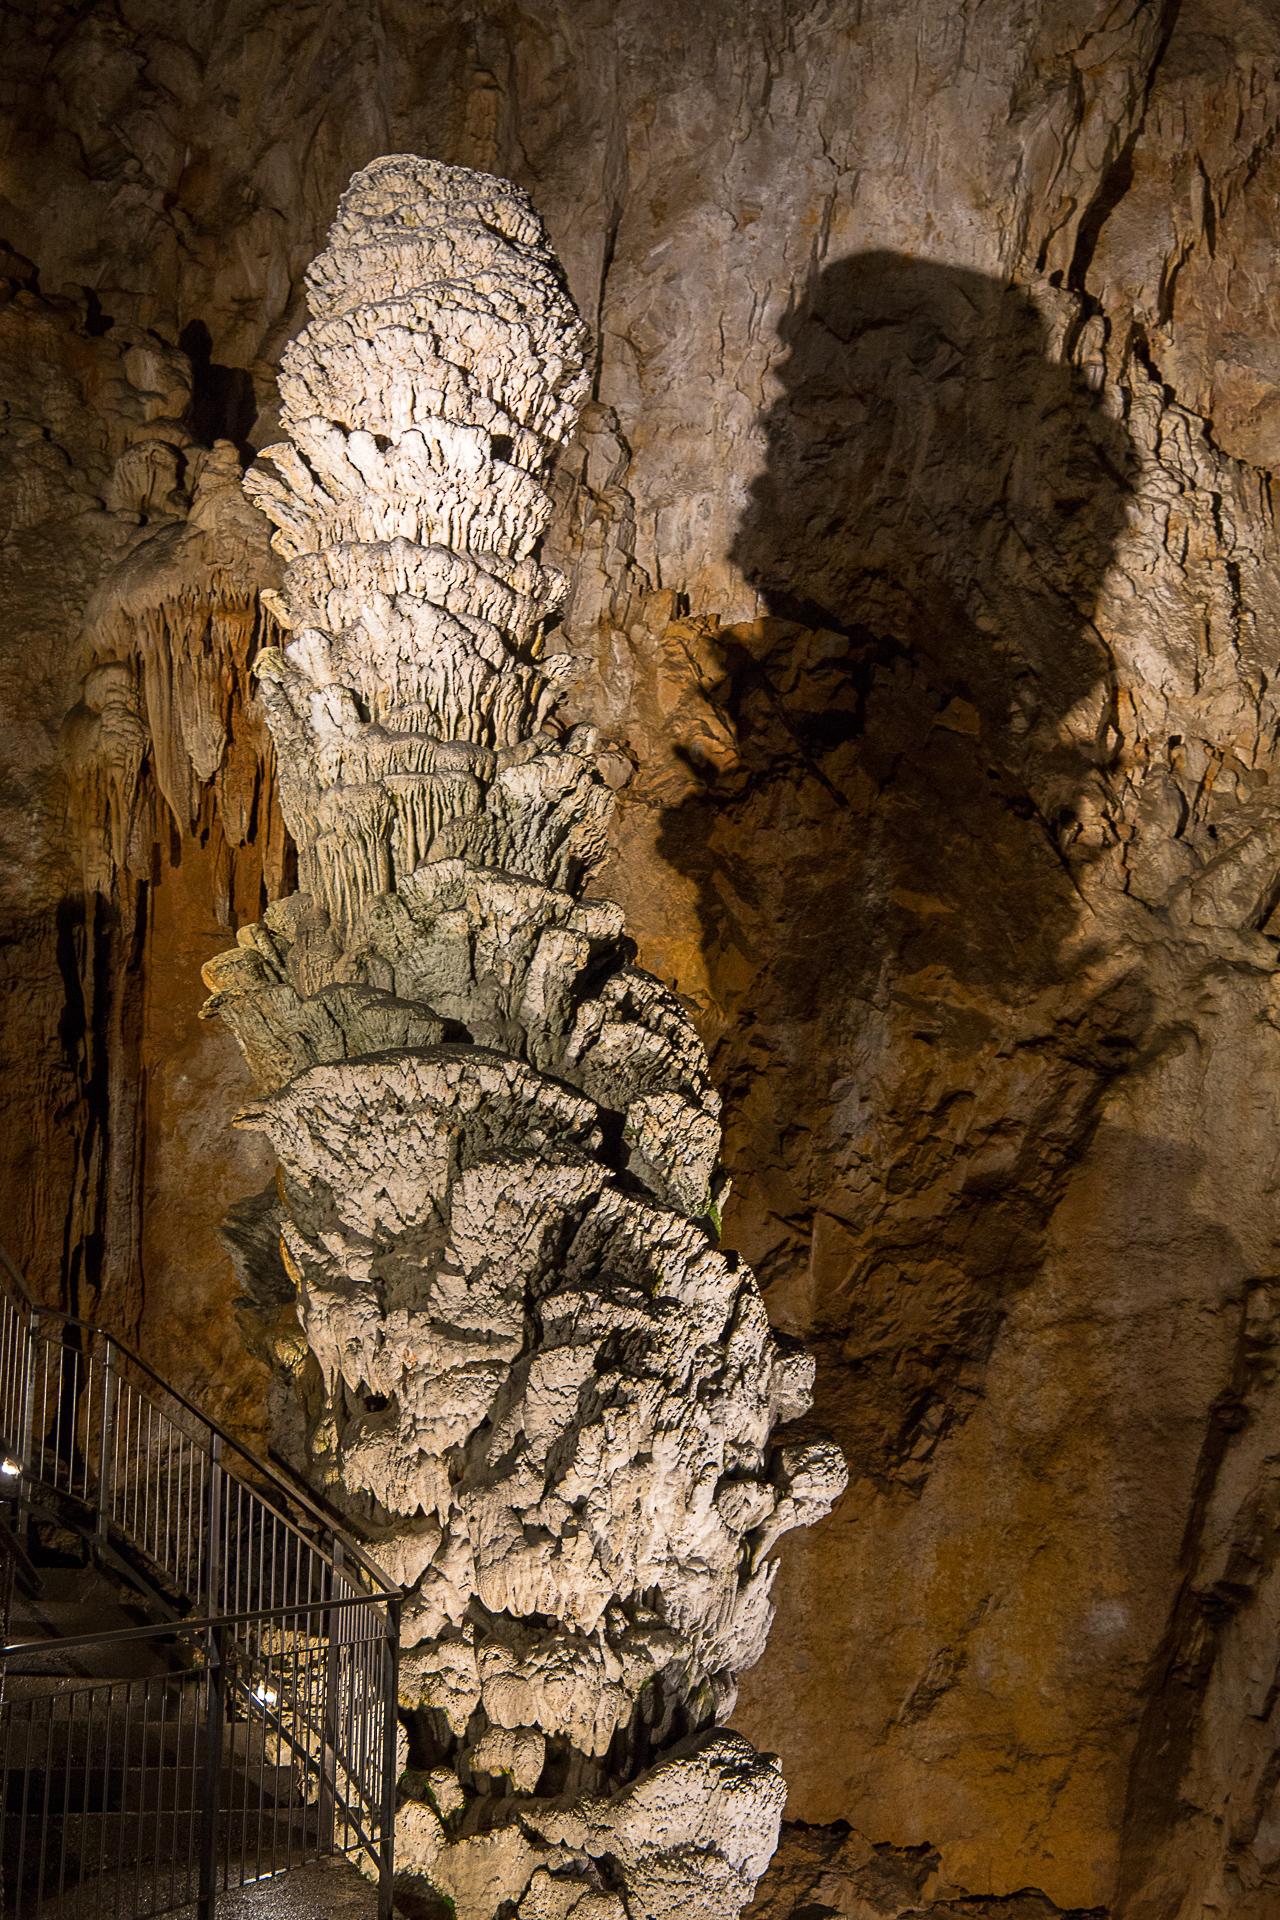 Ruggero Säule mit zwölf Metern Höhe